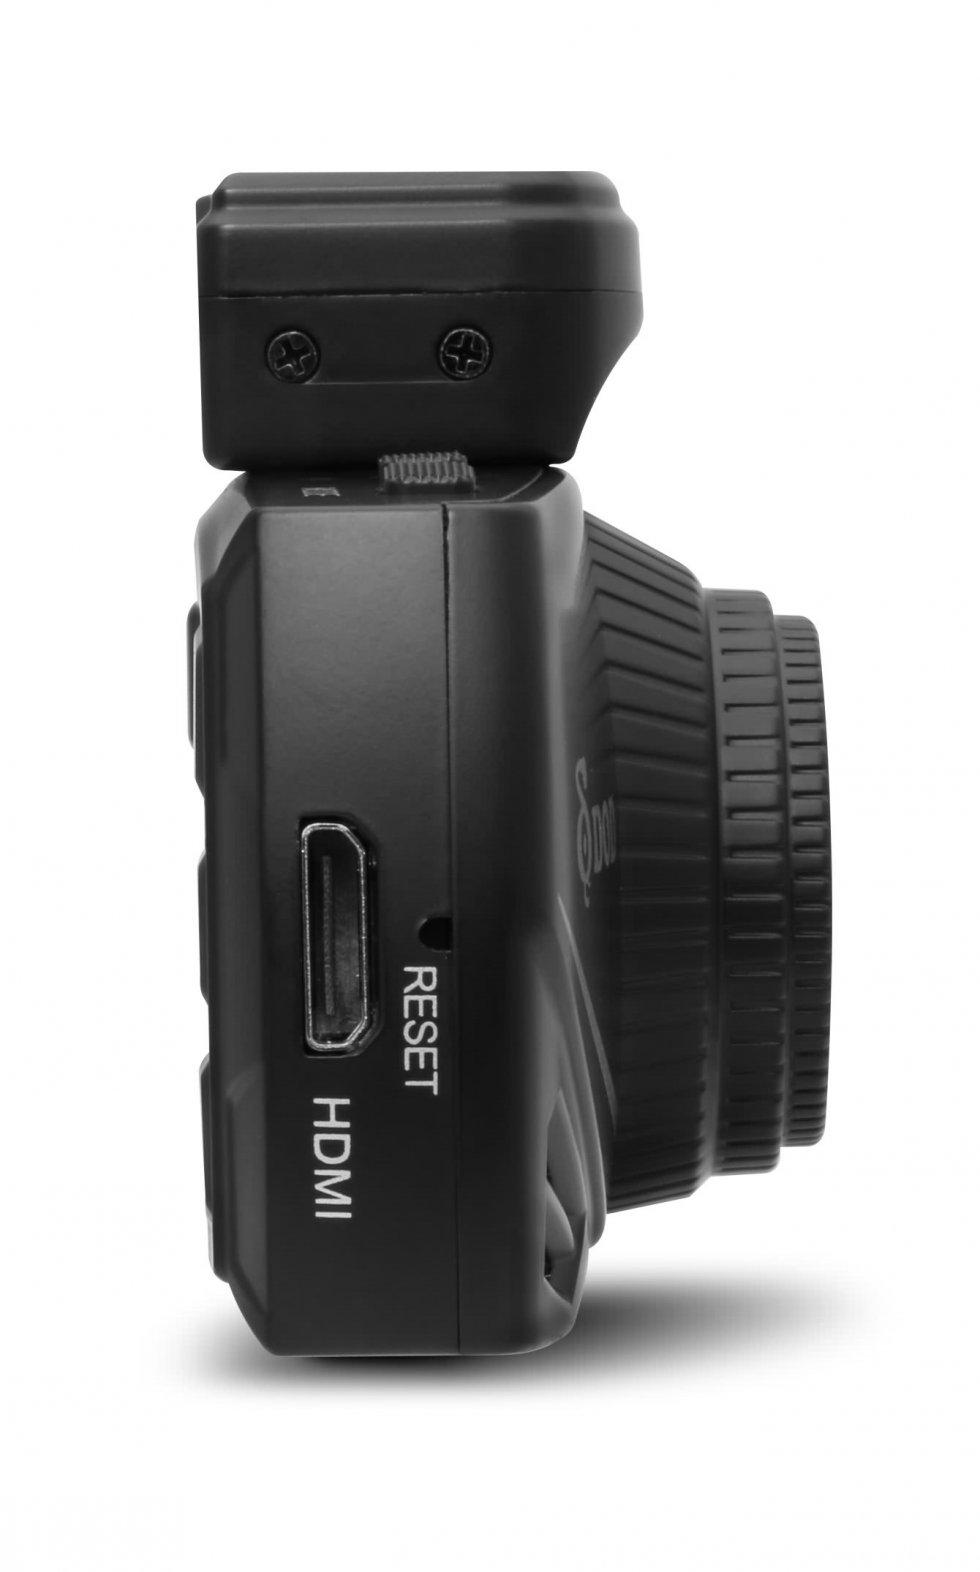 dod ls500w car camera dual full hd 1080p resolution. Black Bedroom Furniture Sets. Home Design Ideas